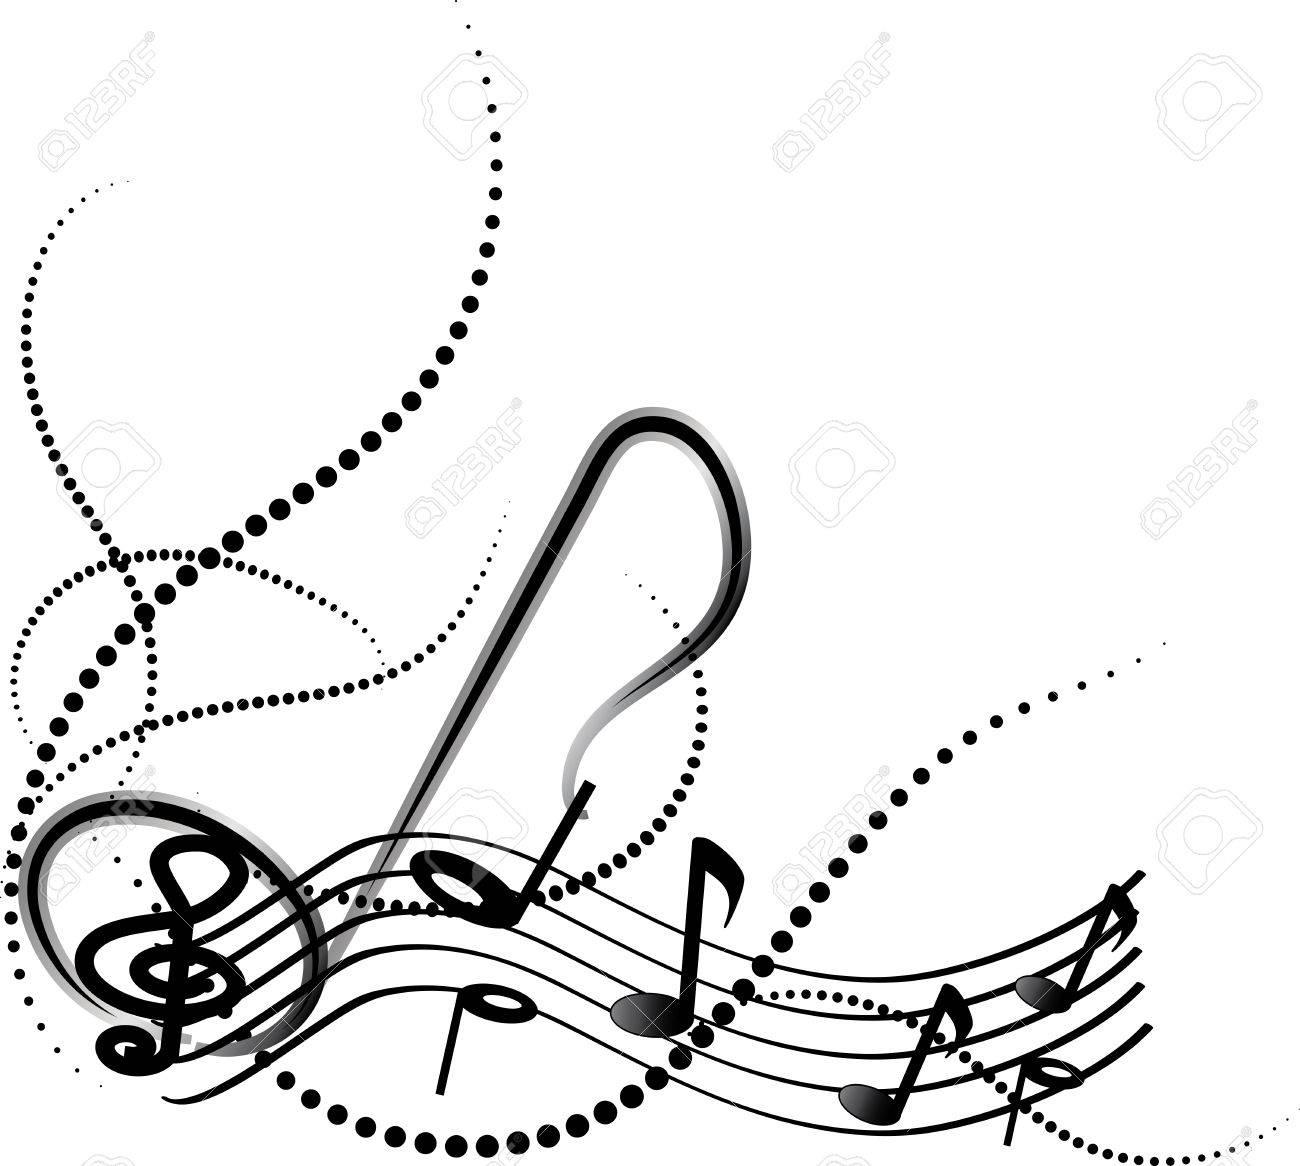 ornamental music notes with swirls on white background royalty free rh 123rf com Black Music Swirls Black Swirl Clip Art